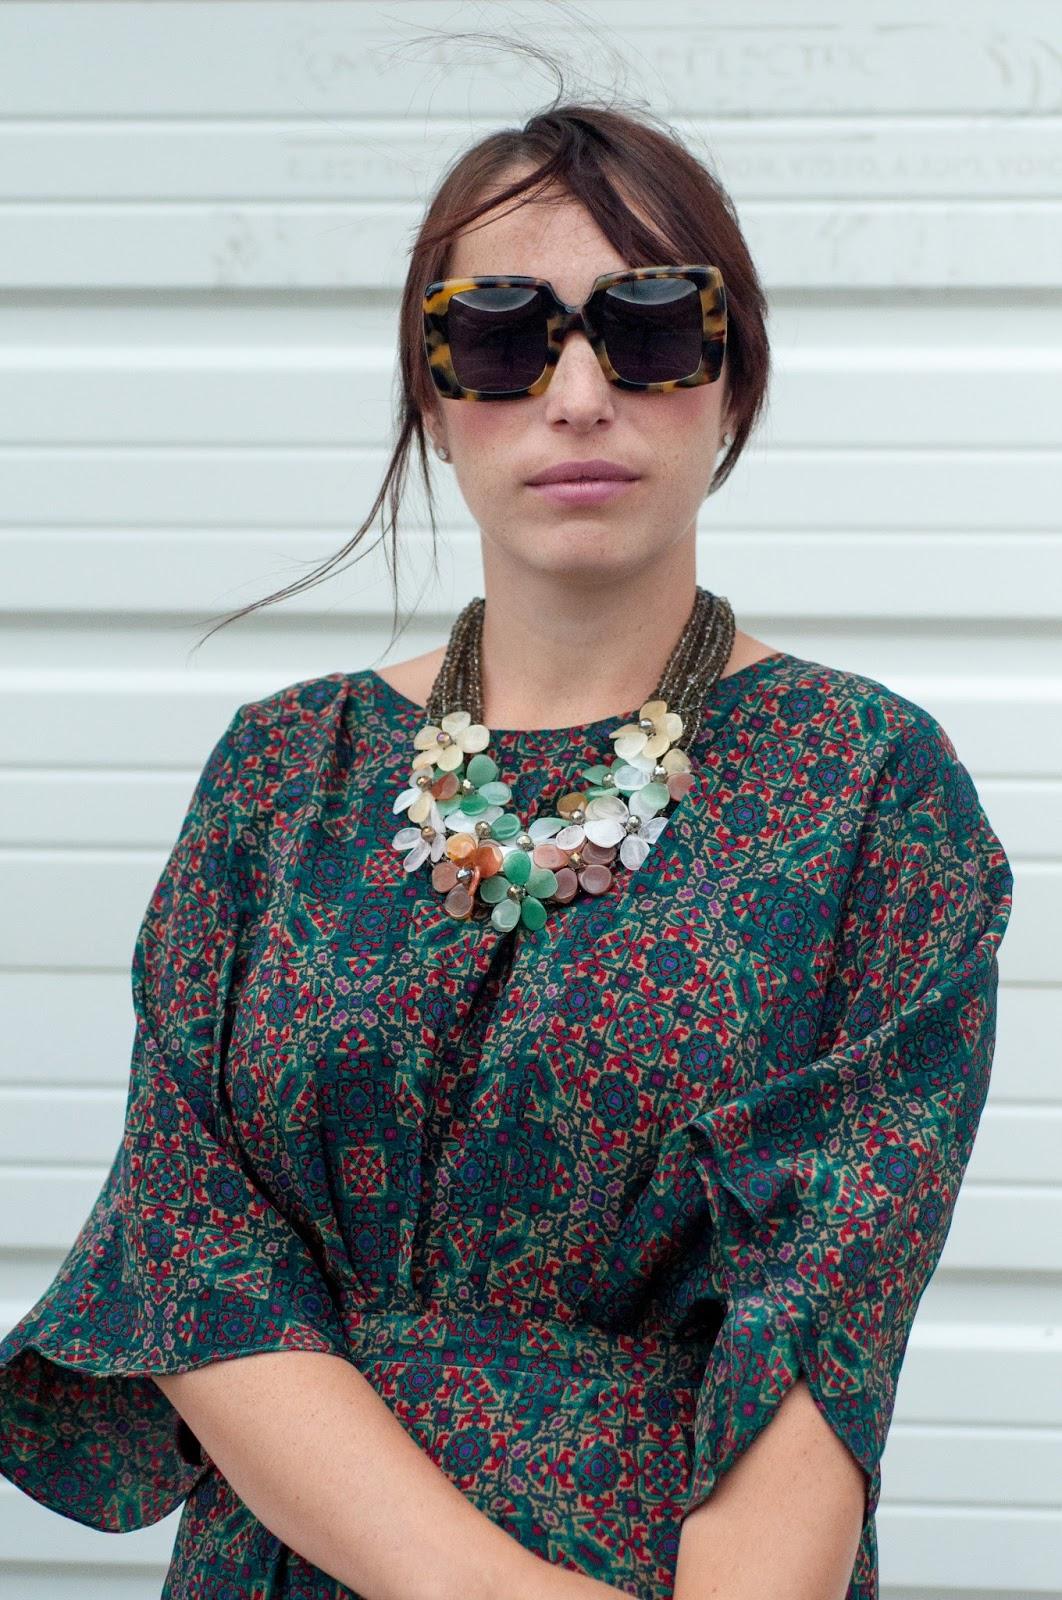 anthropologie dress, anthropologie ootd, ootd, what i wore, floral necklace, karen walker betsy sunglasses, karen walker